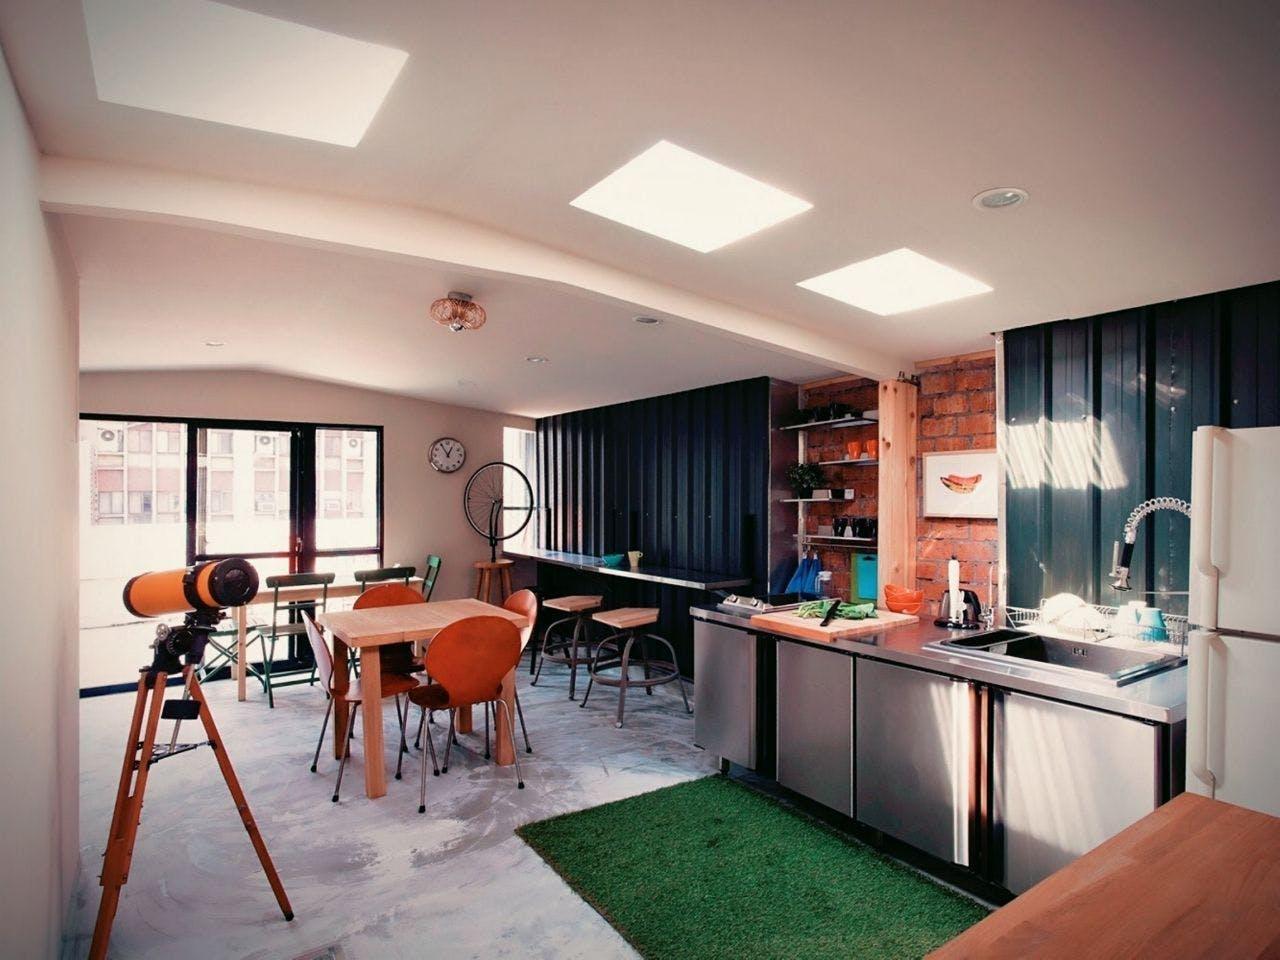 25 Residents | Dongmen | Renovated Spacious Modern Apt. w/ Workspace + Rooftop Deck